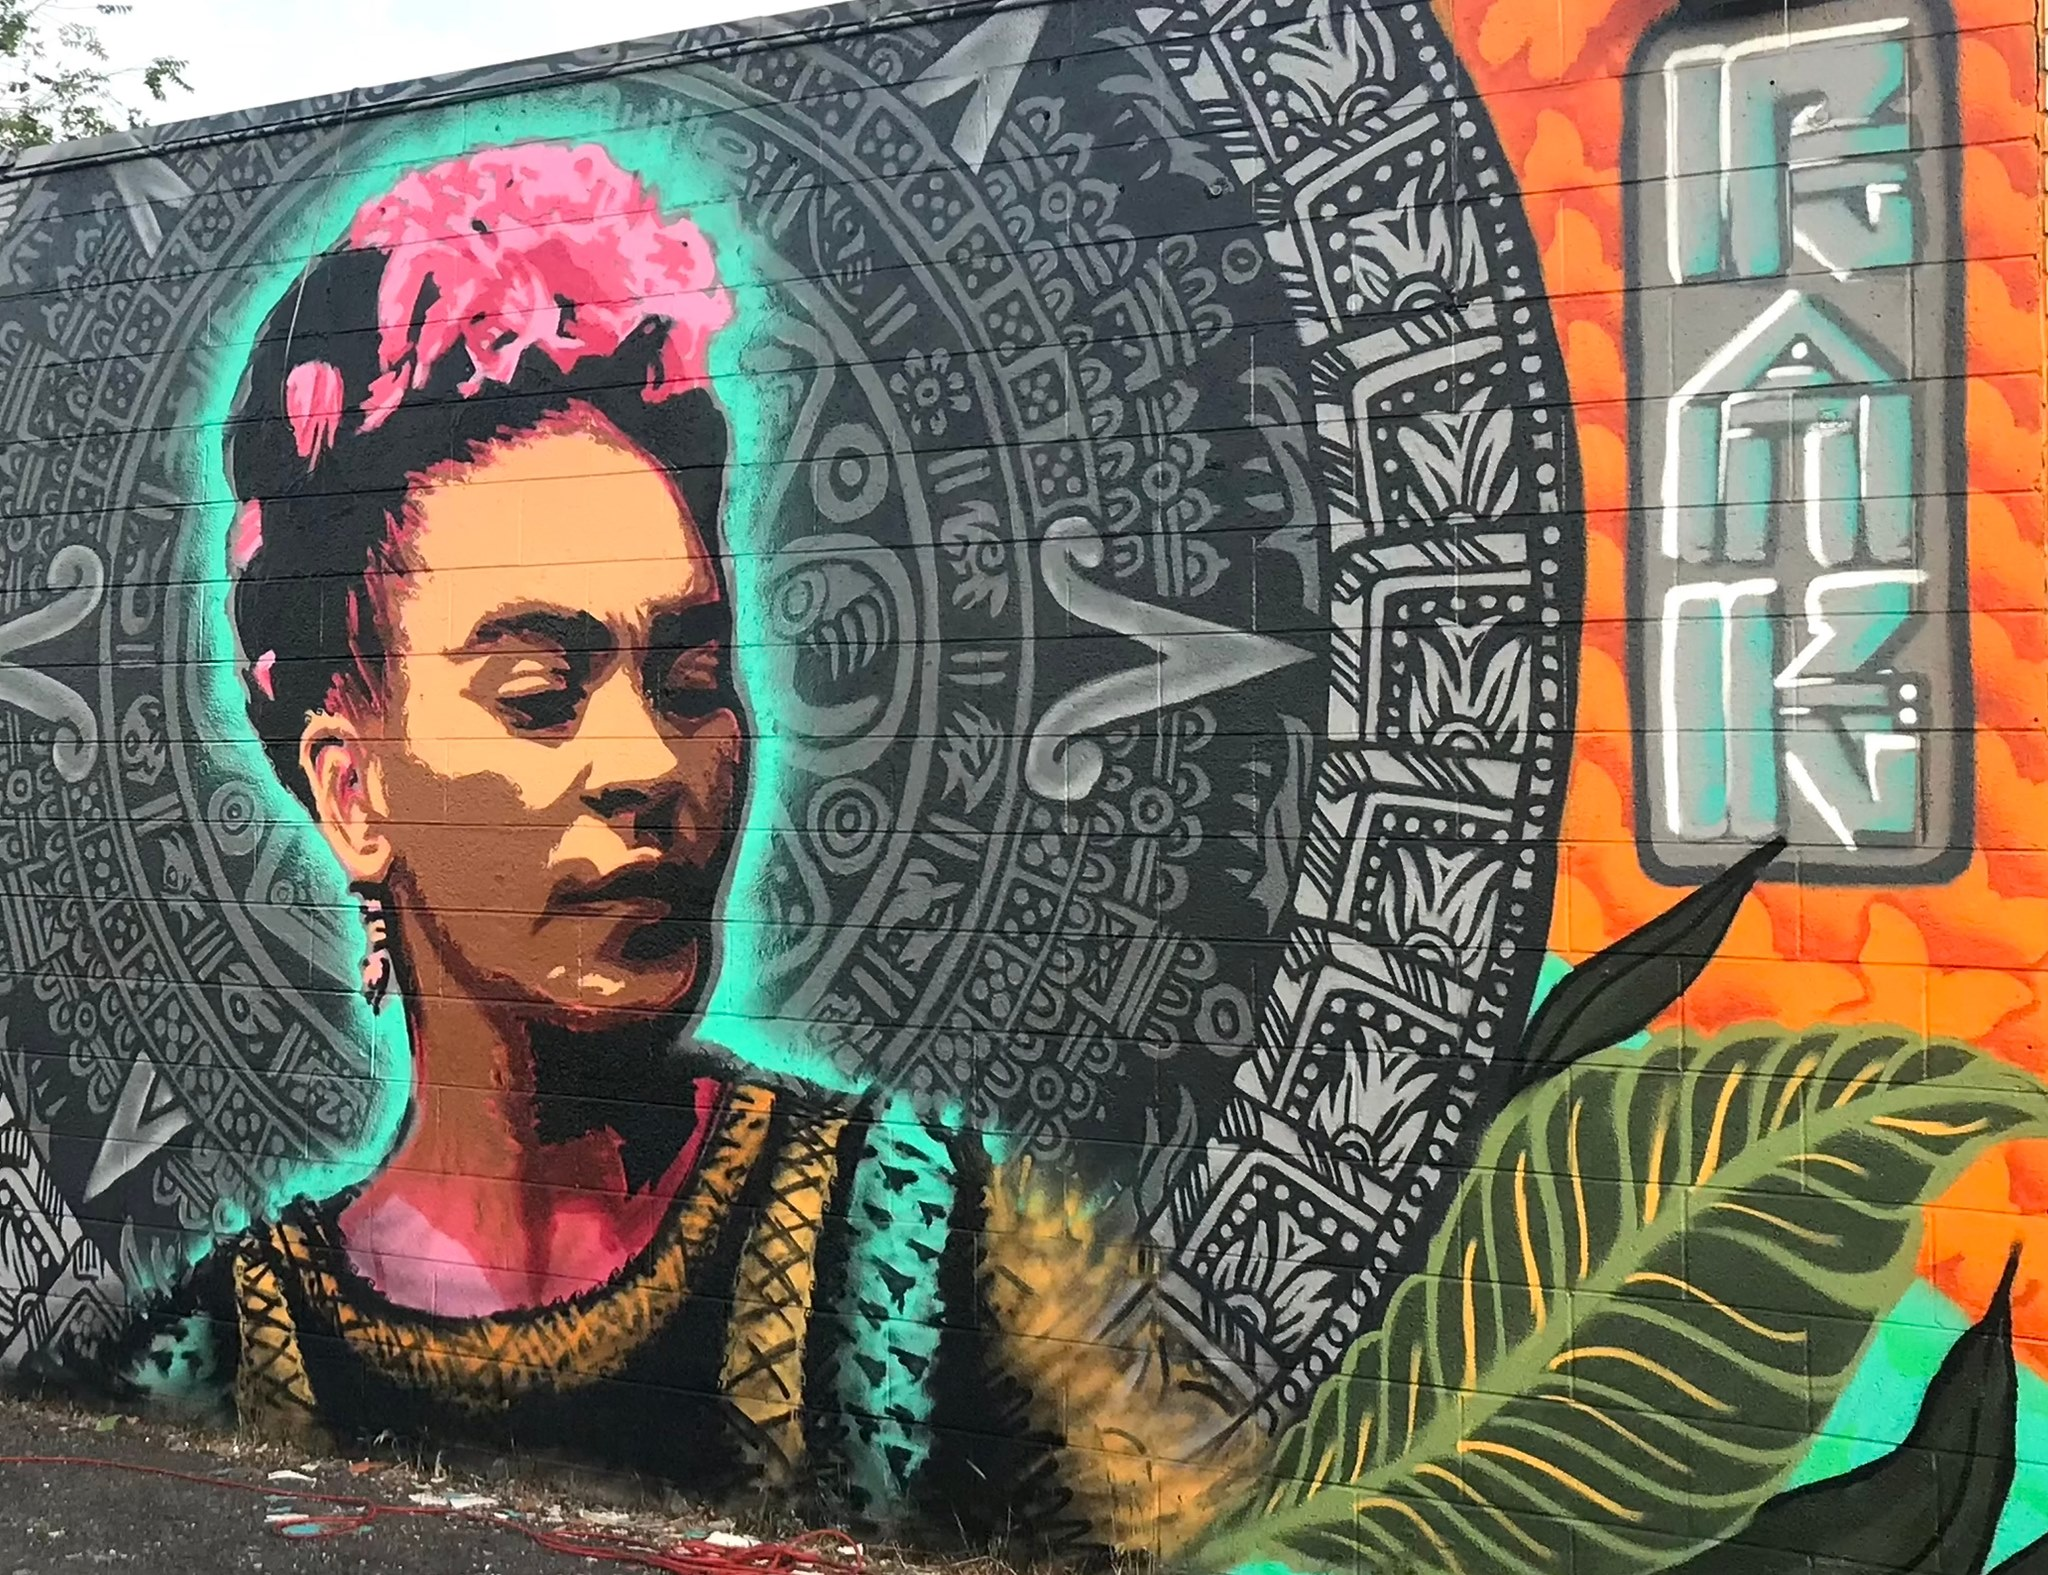 Roots Art Kollective, Frida Mural (2020), Panaderia Mexico, Salt Lake City. Photo Miguel Galaz